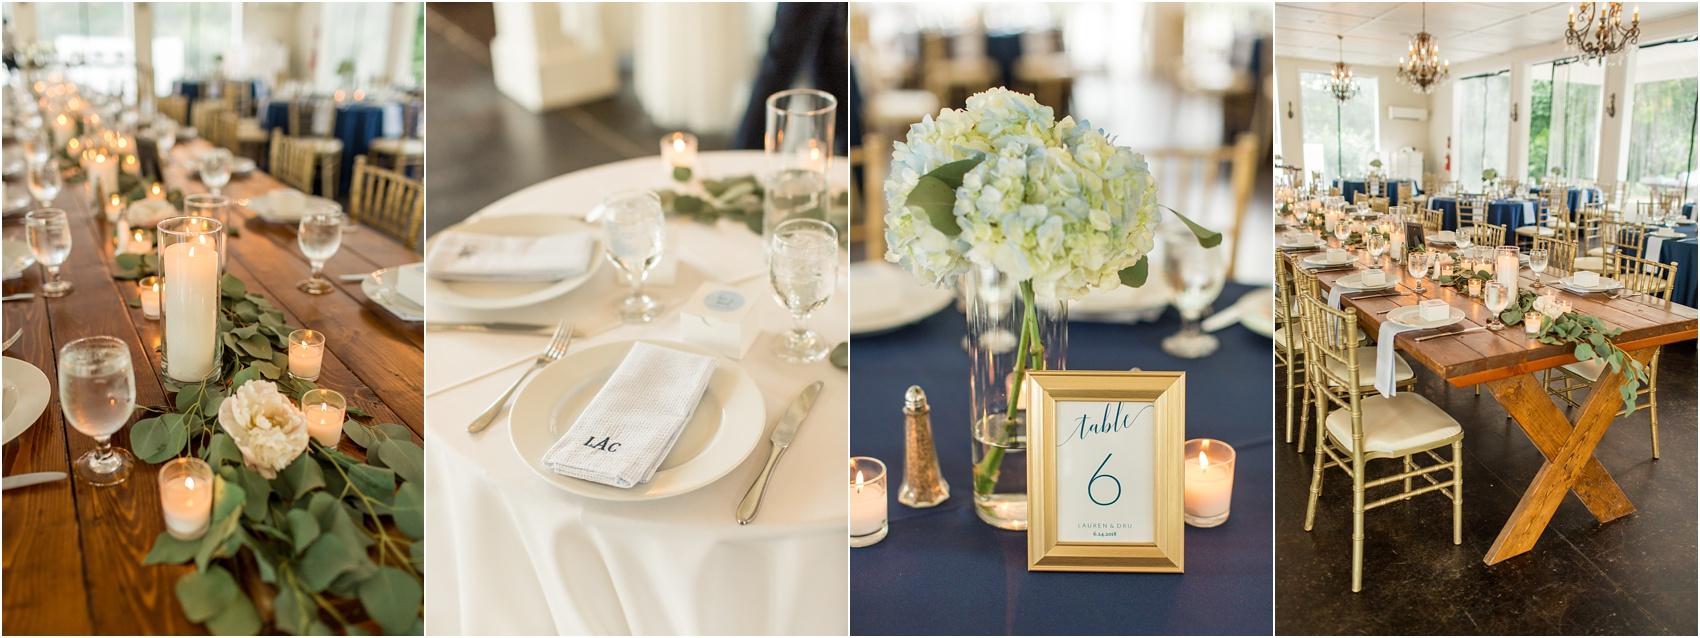 Savannah Eve Photography- Sigl-Adams Wedding- Sneak Peek-65.jpg